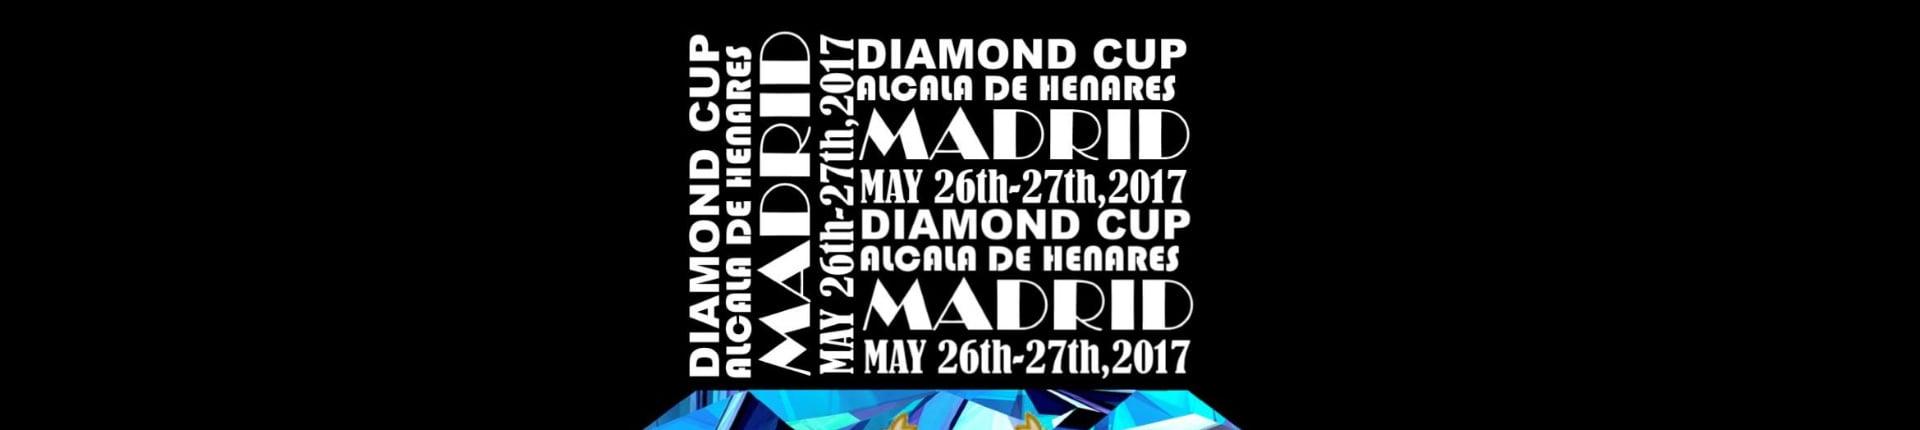 IFBB Diamond Cup - Madryt 2018